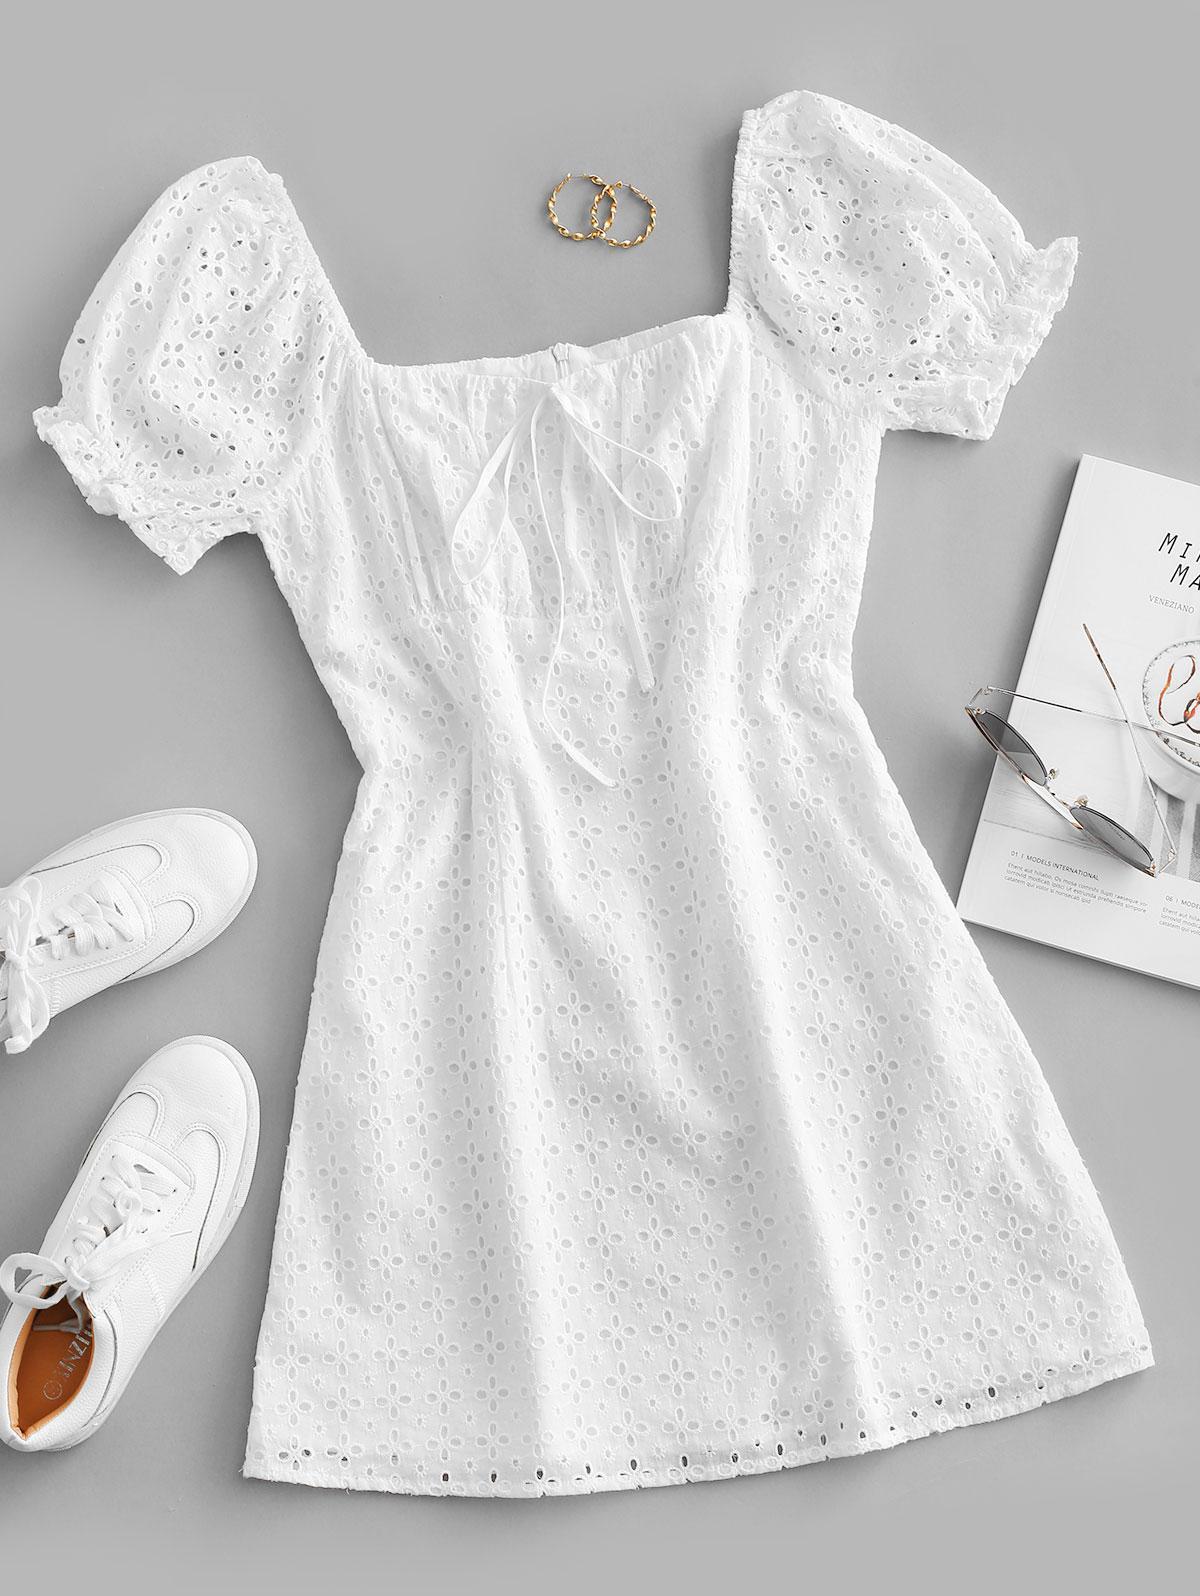 ZAFUL Eyelet Bowknot Puff Sleeve Mini Dress